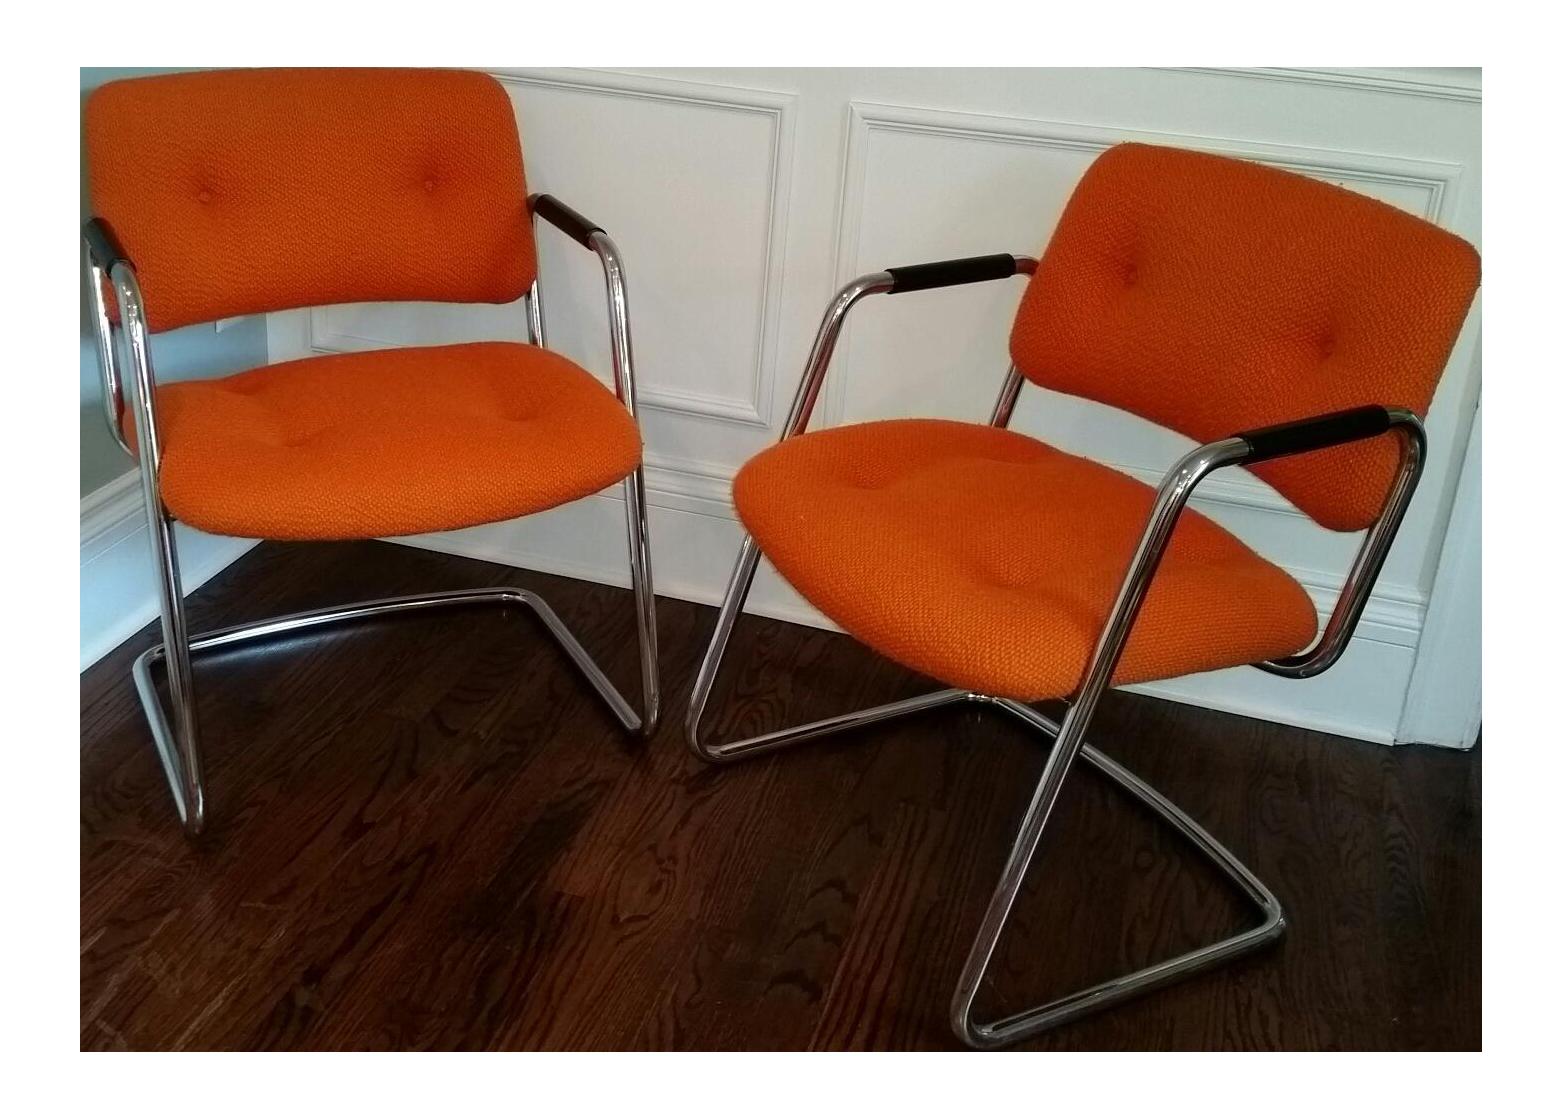 Orange Chrome Steelcase Cantilever Chairs - A Pair | Chairish